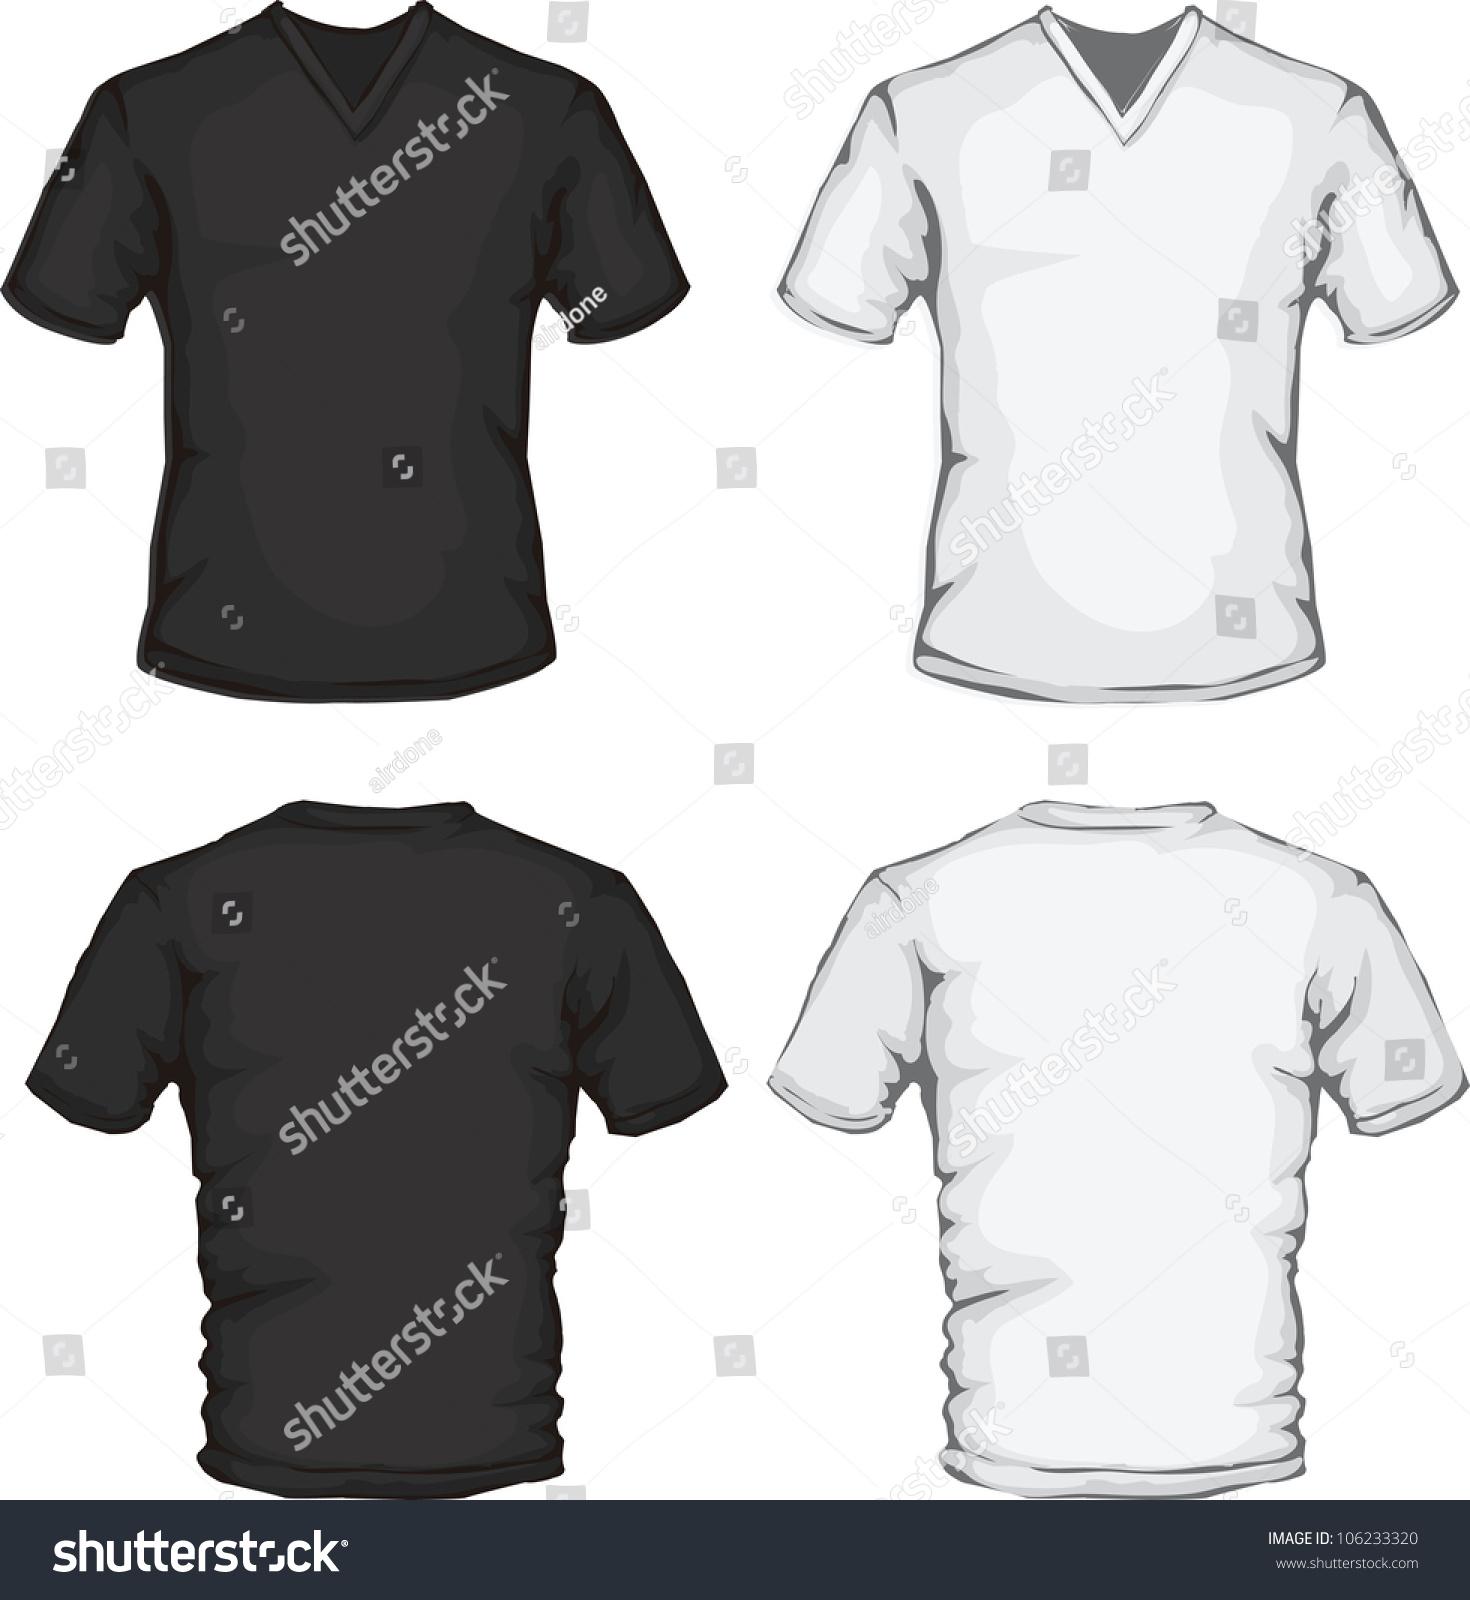 Tshirtgangcom  T Shirt Printing Drop Shipping Fulfillment